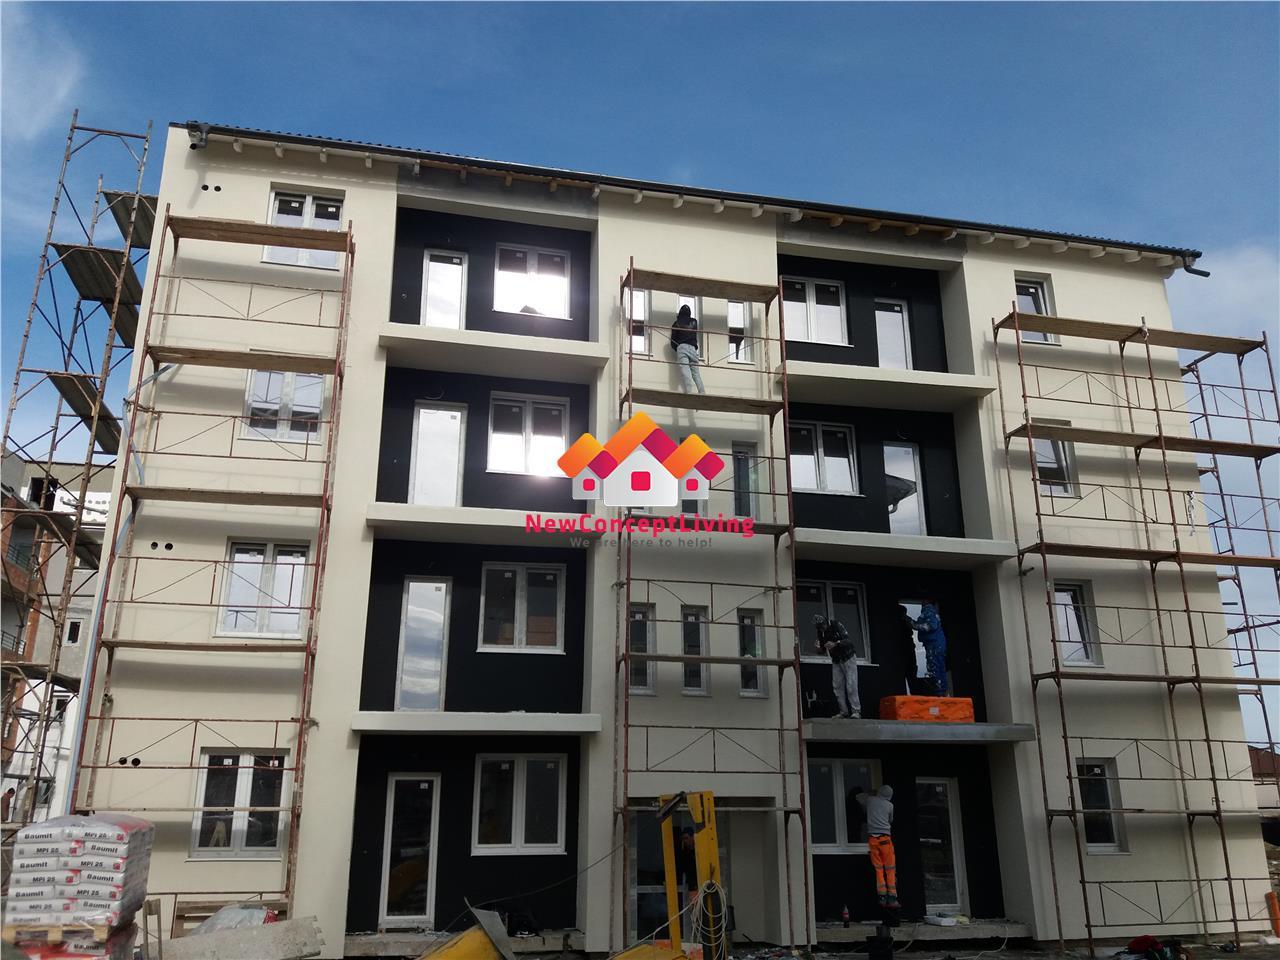 Apartament de vanzare in Sibiu- 2 camere,cu gradina-bucatarie separata